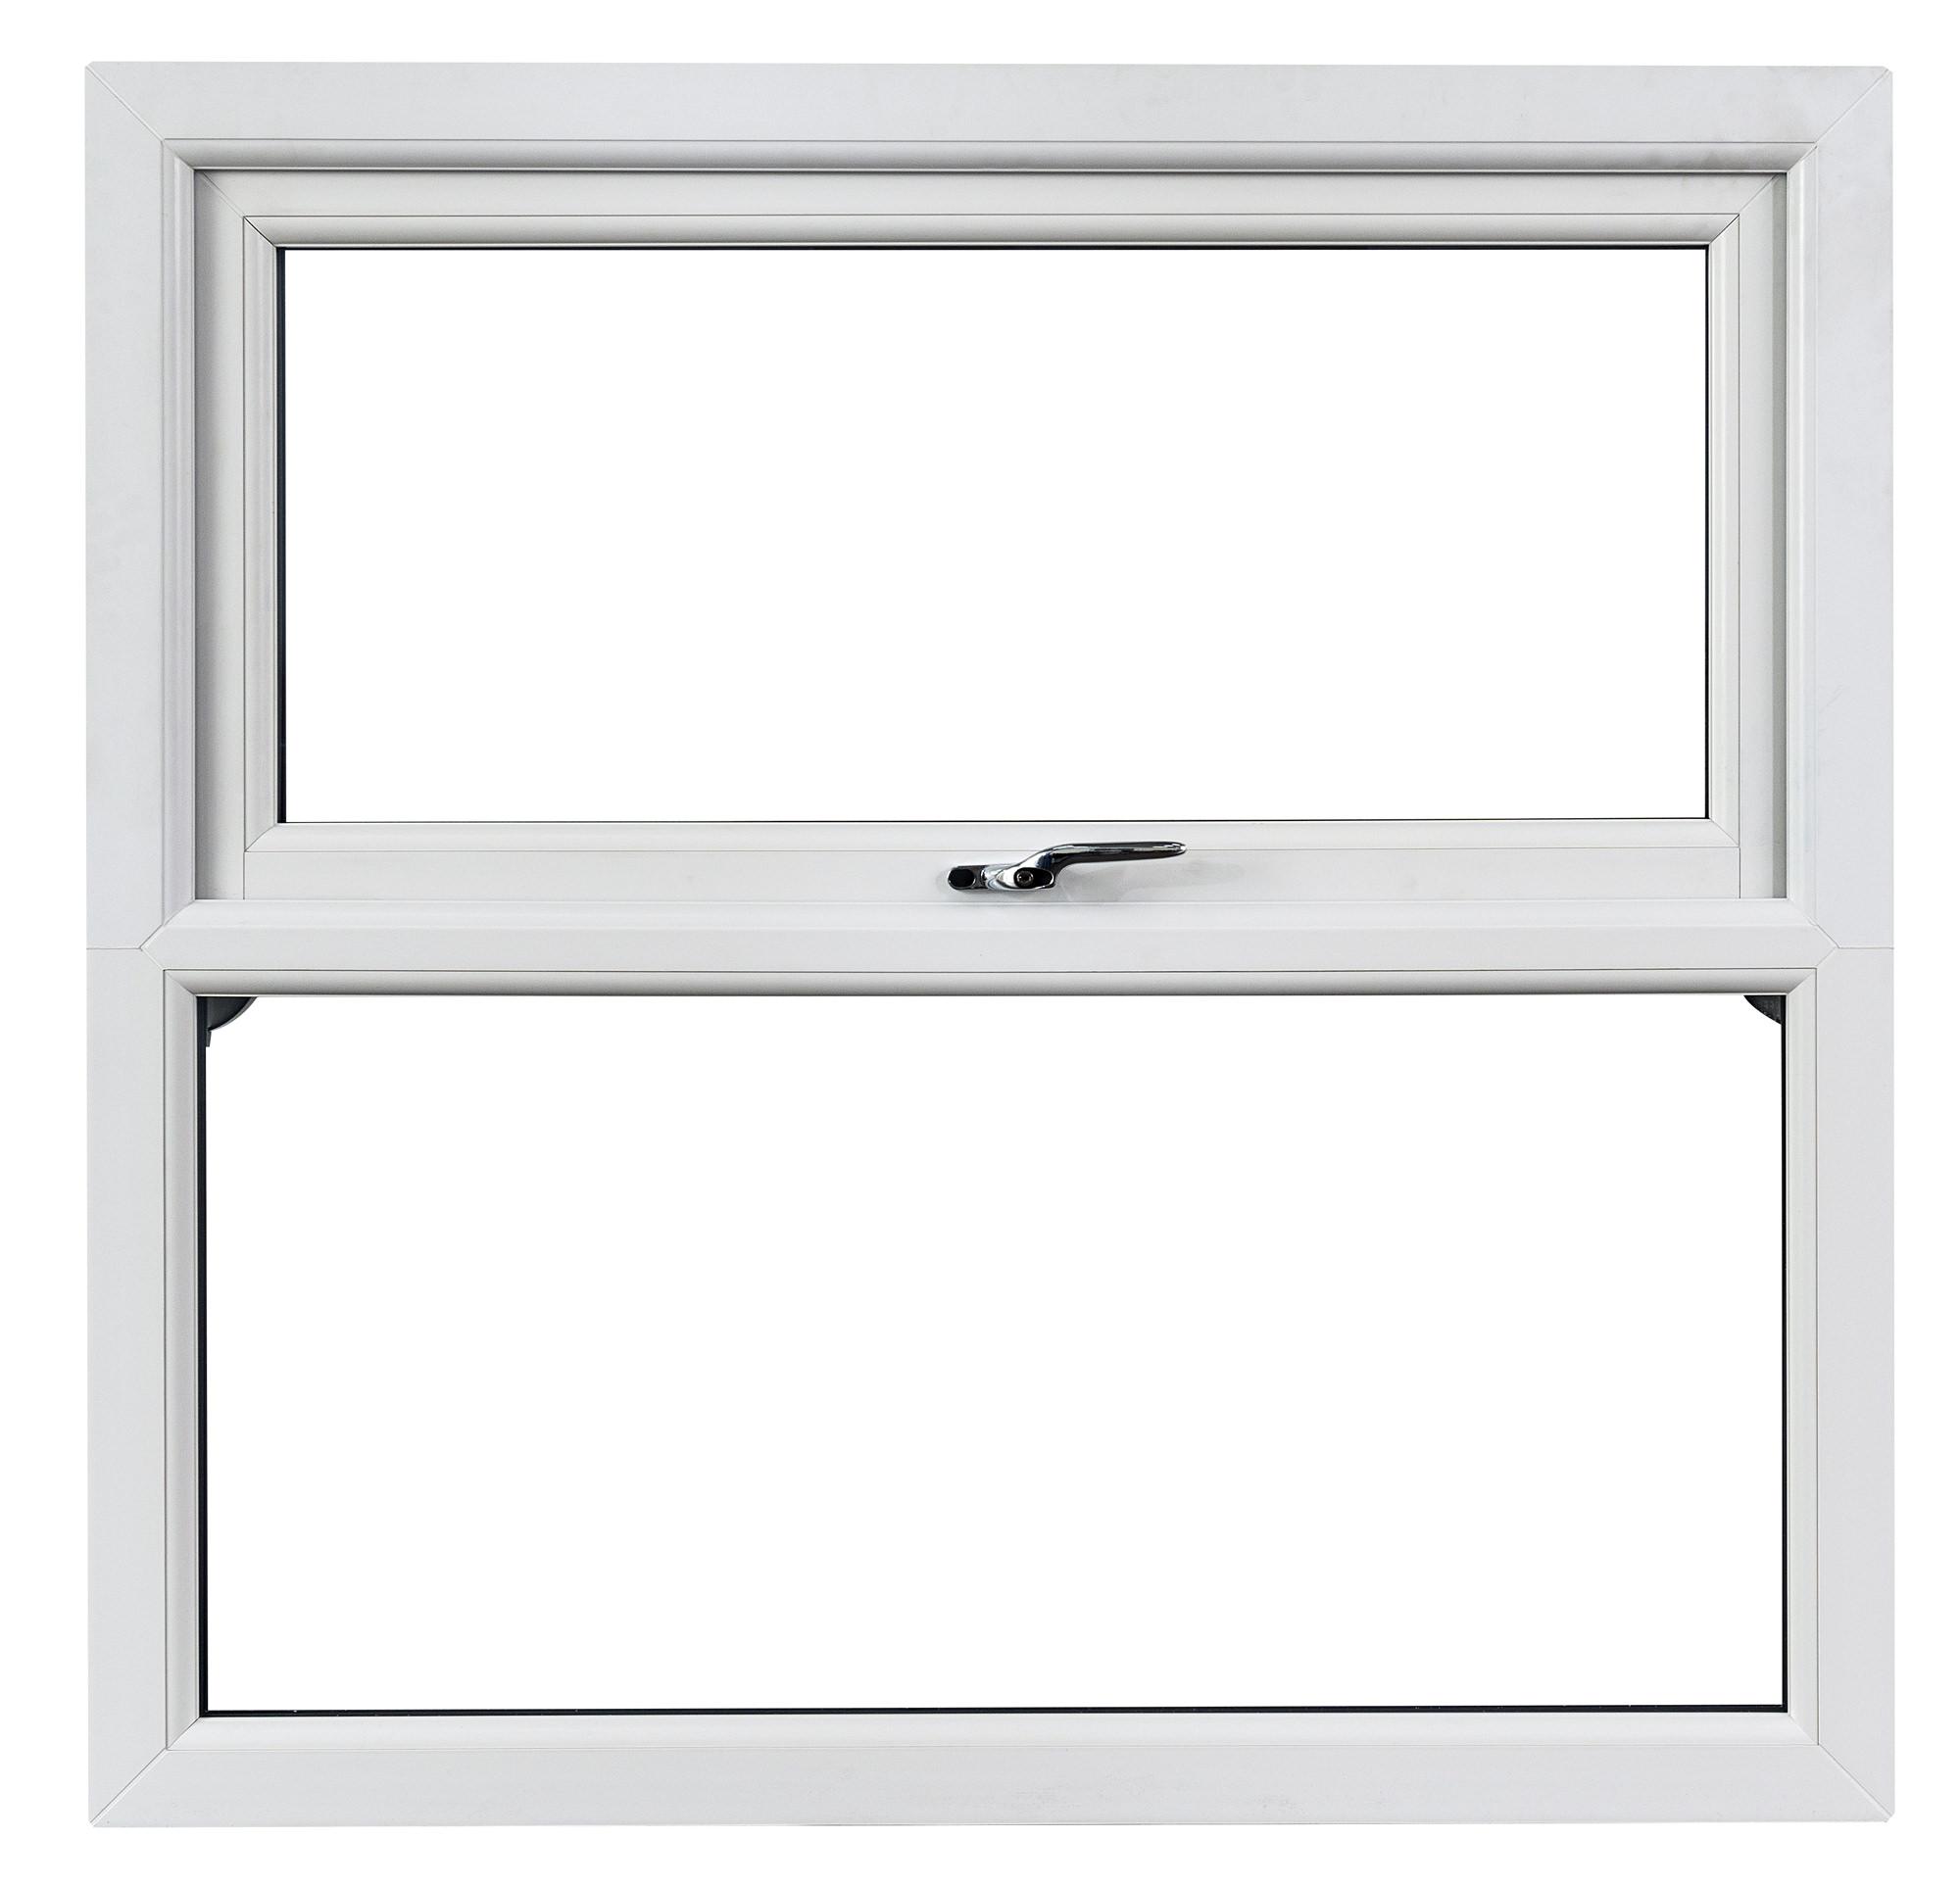 uPVC Casement Windows Glasgow